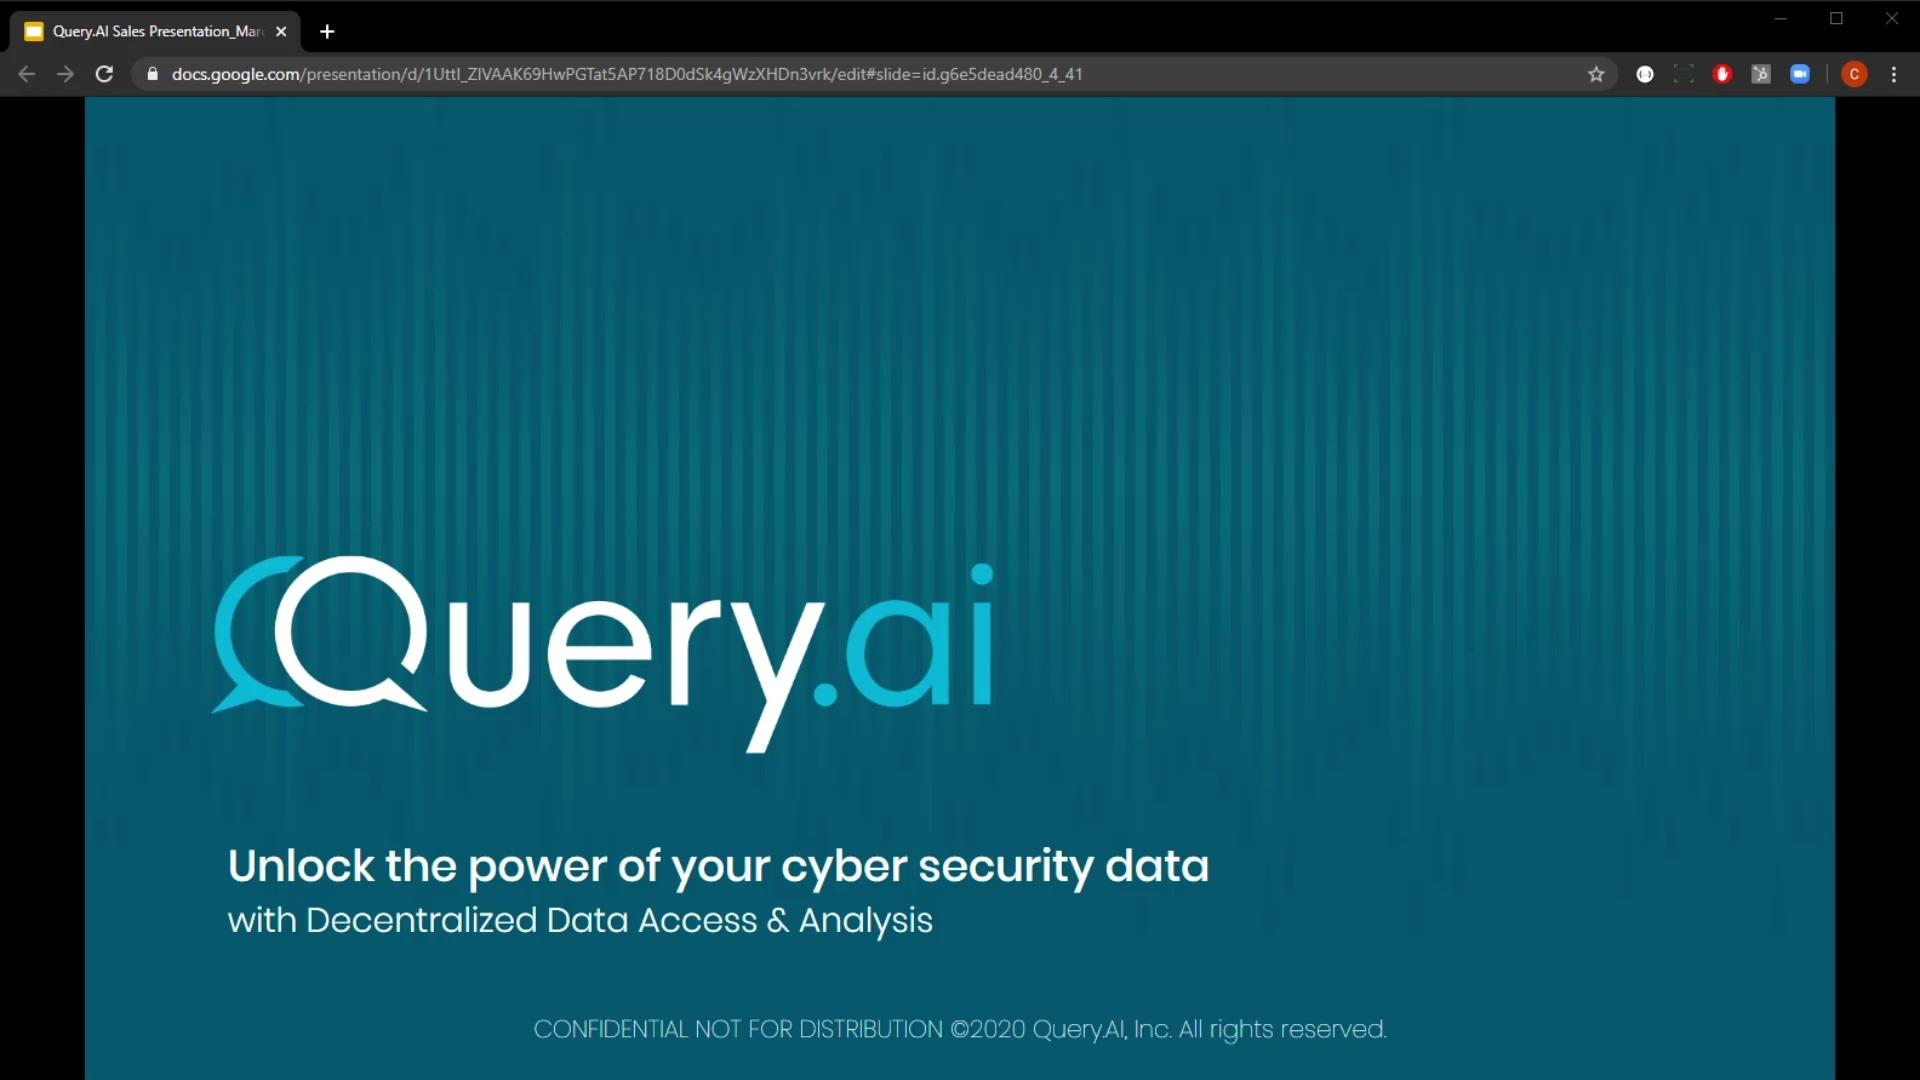 Query.AI 5 Minute Demo April 2020